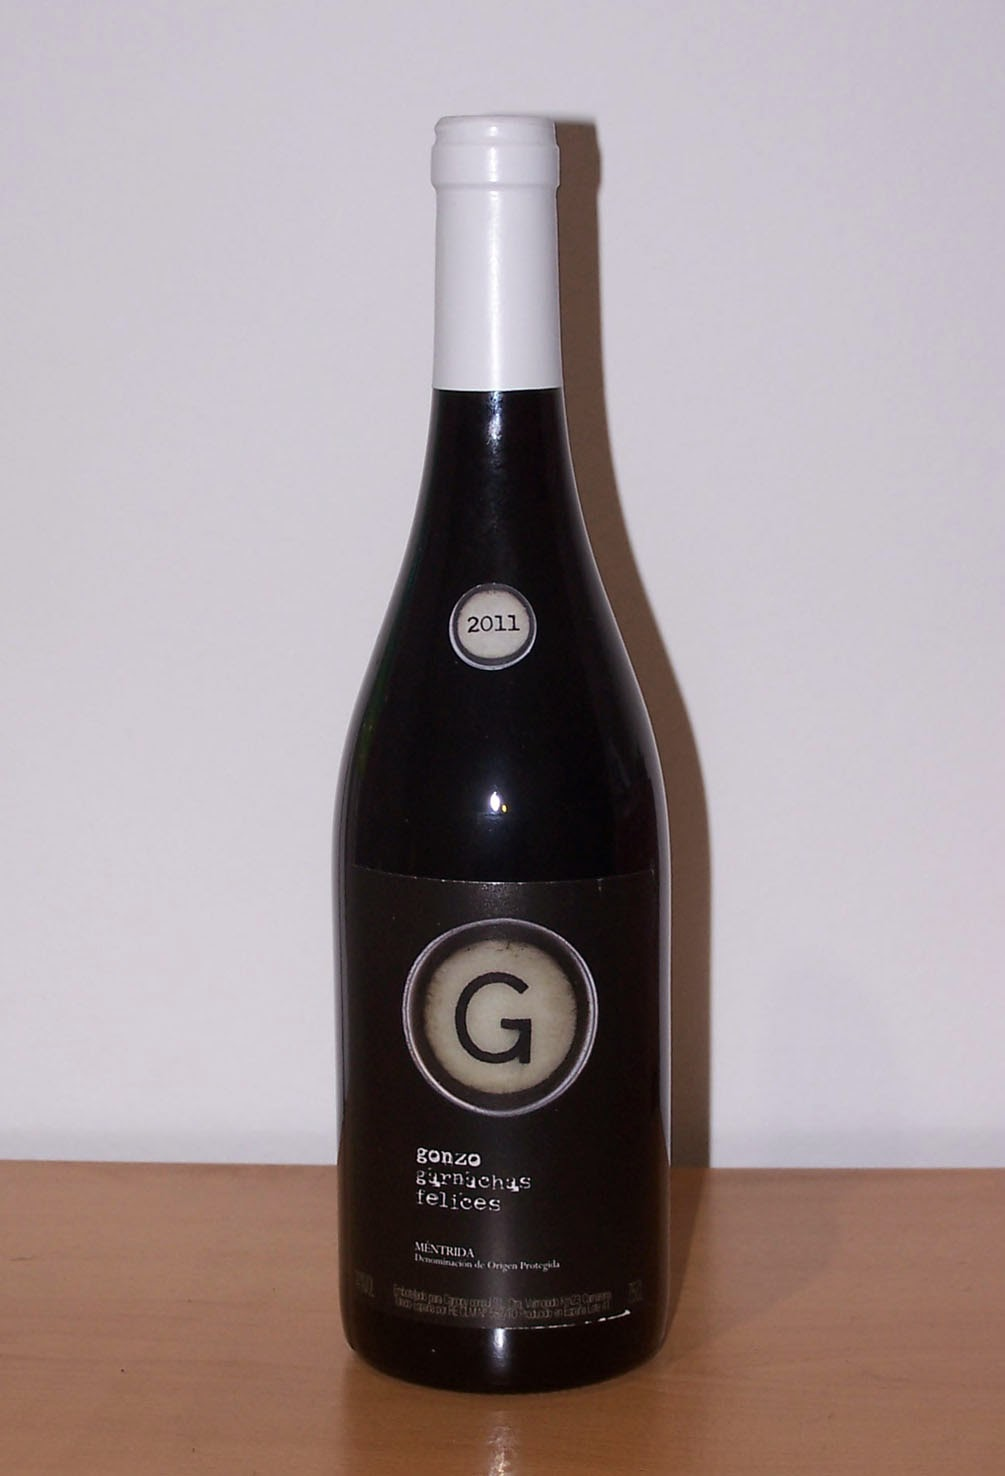 Gonzo 2011, D.o. Méntrida